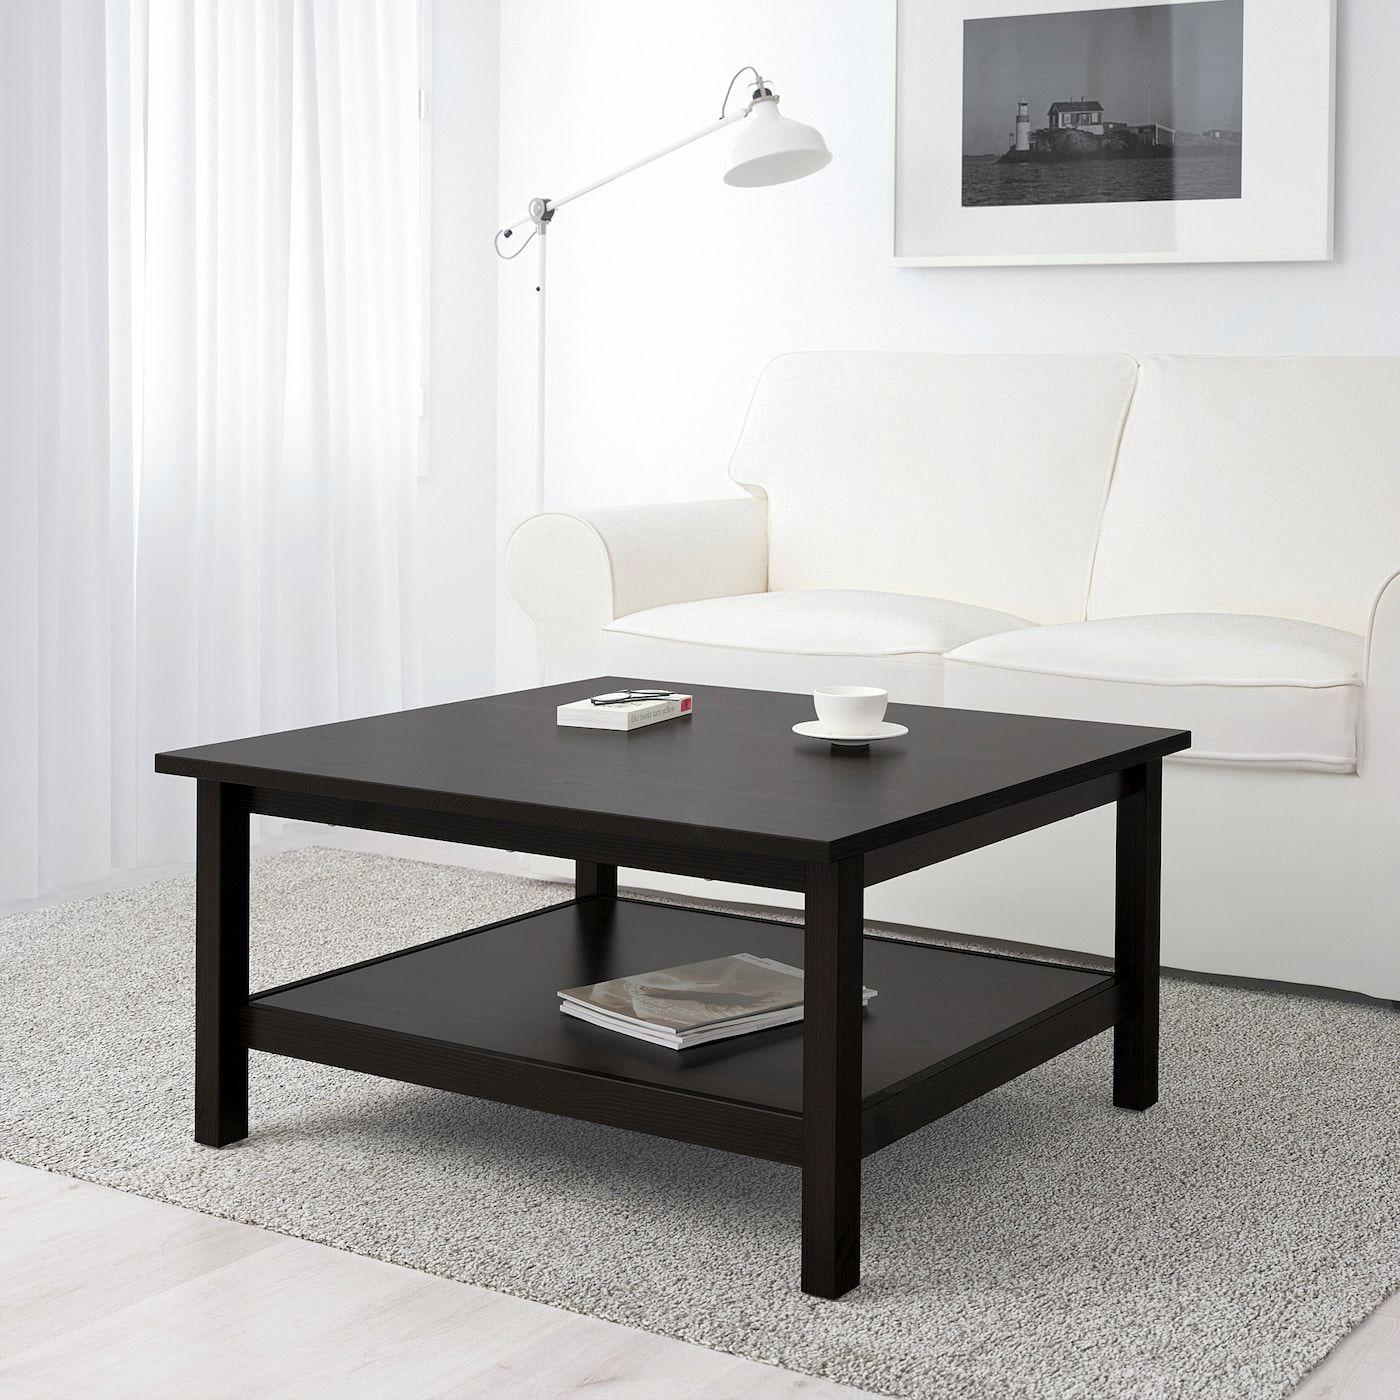 Hemnes Black Brown Coffee Table 90x90 Cm Ikea In 2021 Ikea Coffee Table Ikea Hemnes Coffee Table Coffee Table Square [ 1400 x 1400 Pixel ]